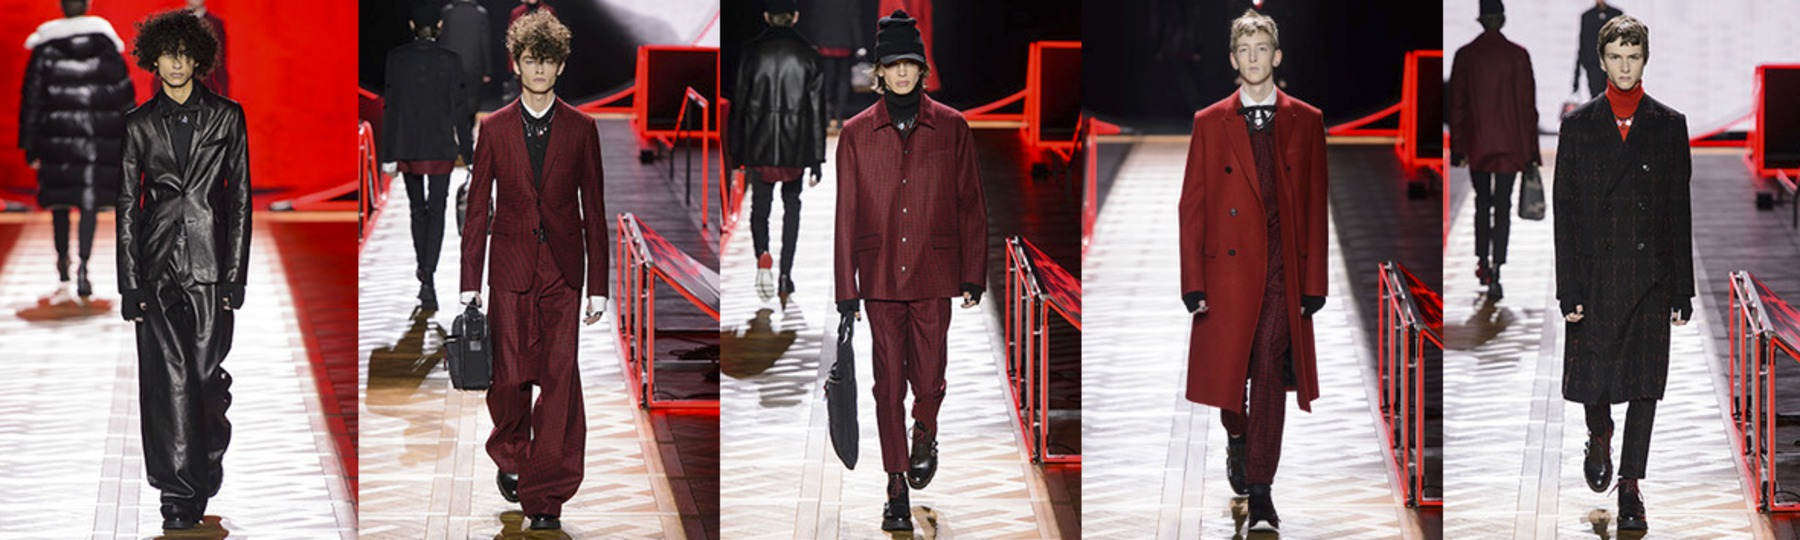 Dior Homme (Image 4)